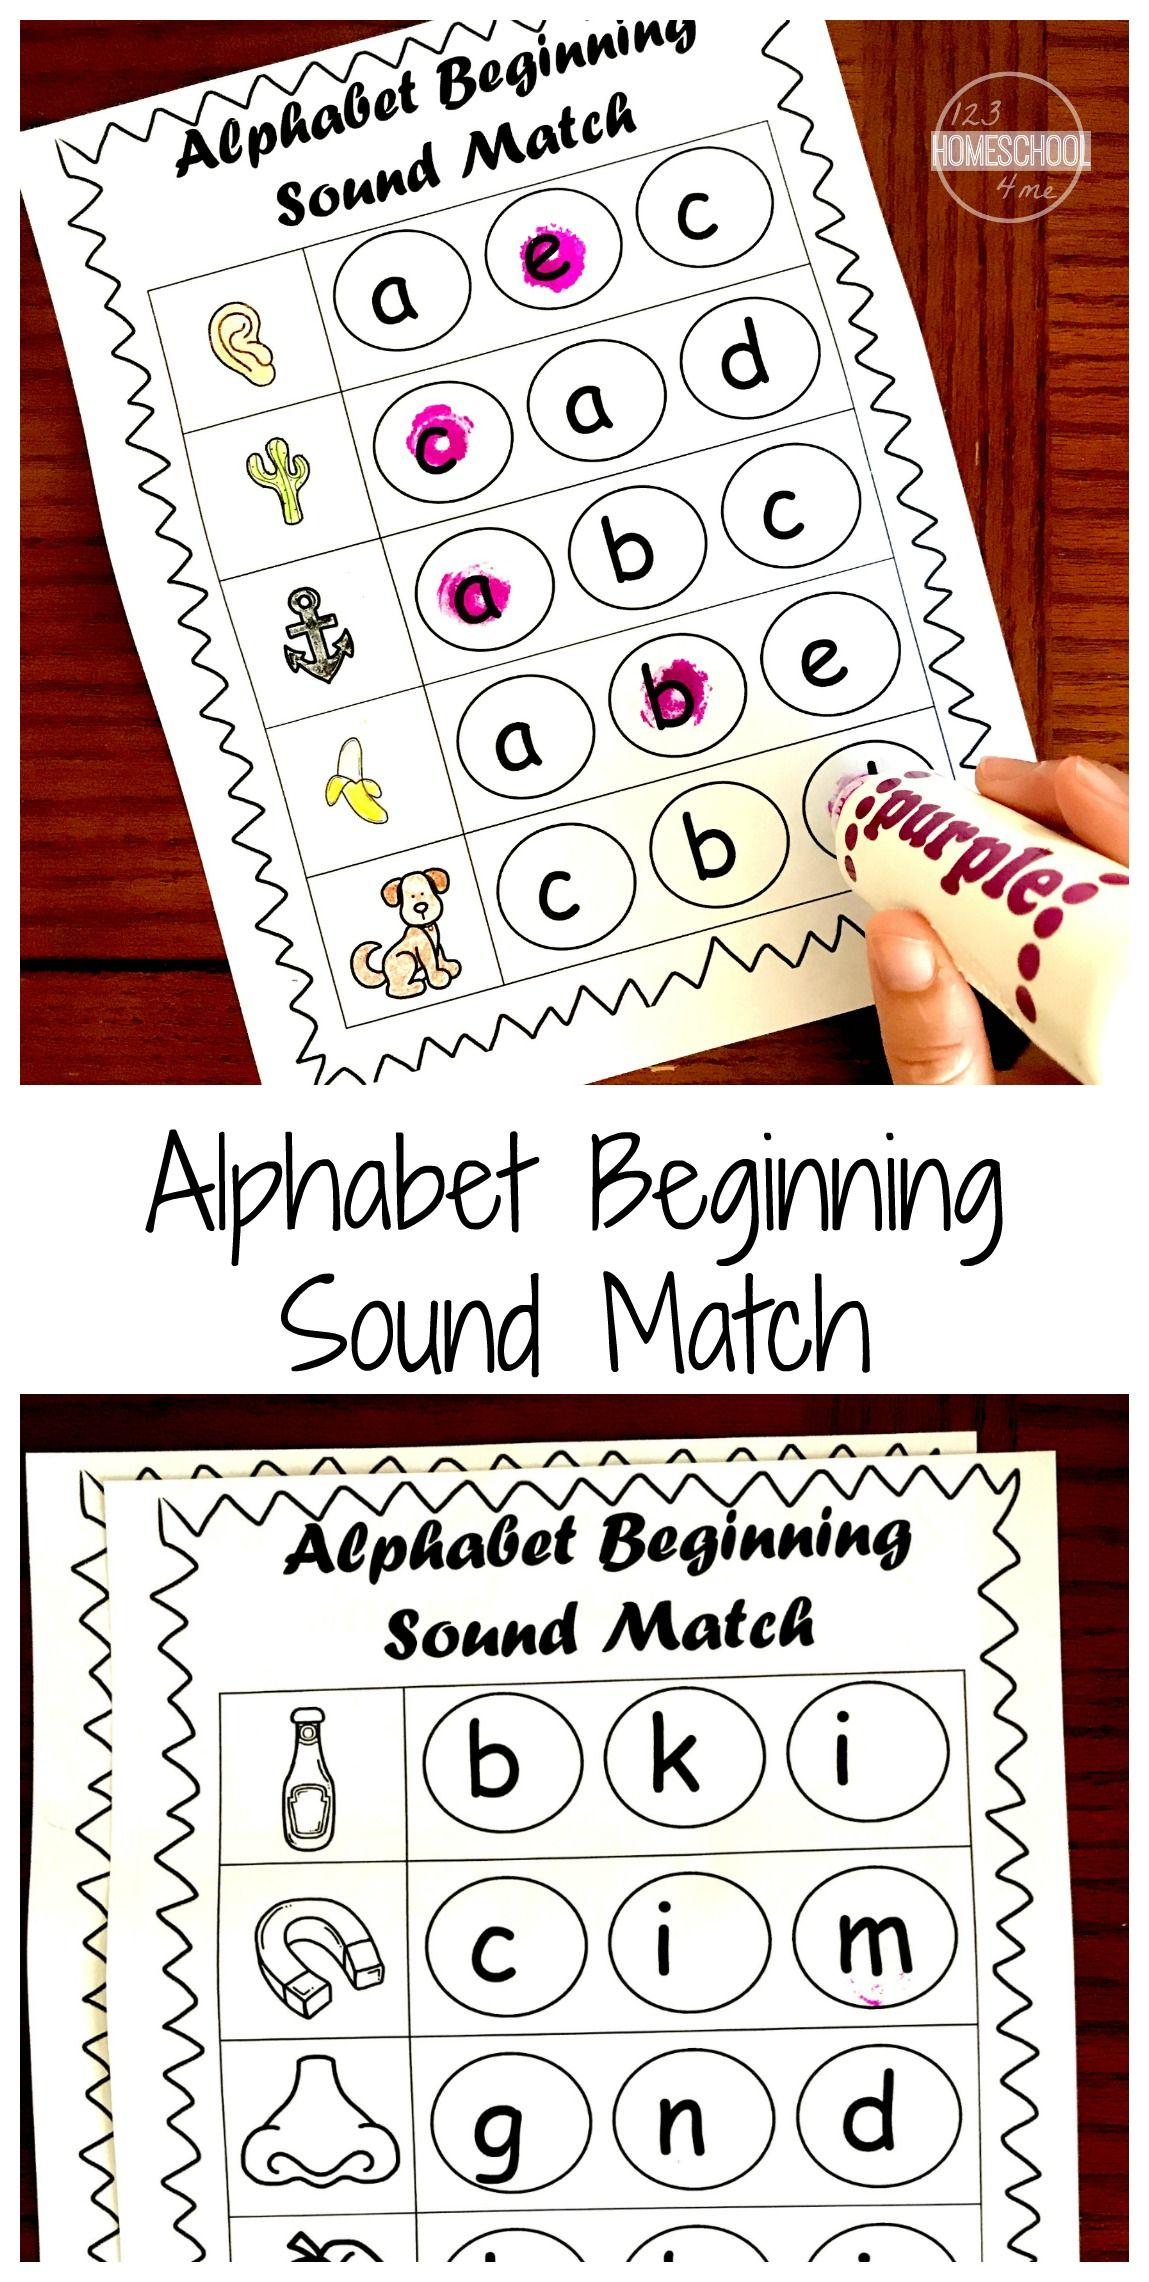 Free Beginning Sounds Worksheets Beginning Sounds Worksheets Phonics Kindergarten Kindergarten Phonics Worksheets [ 2282 x 1149 Pixel ]